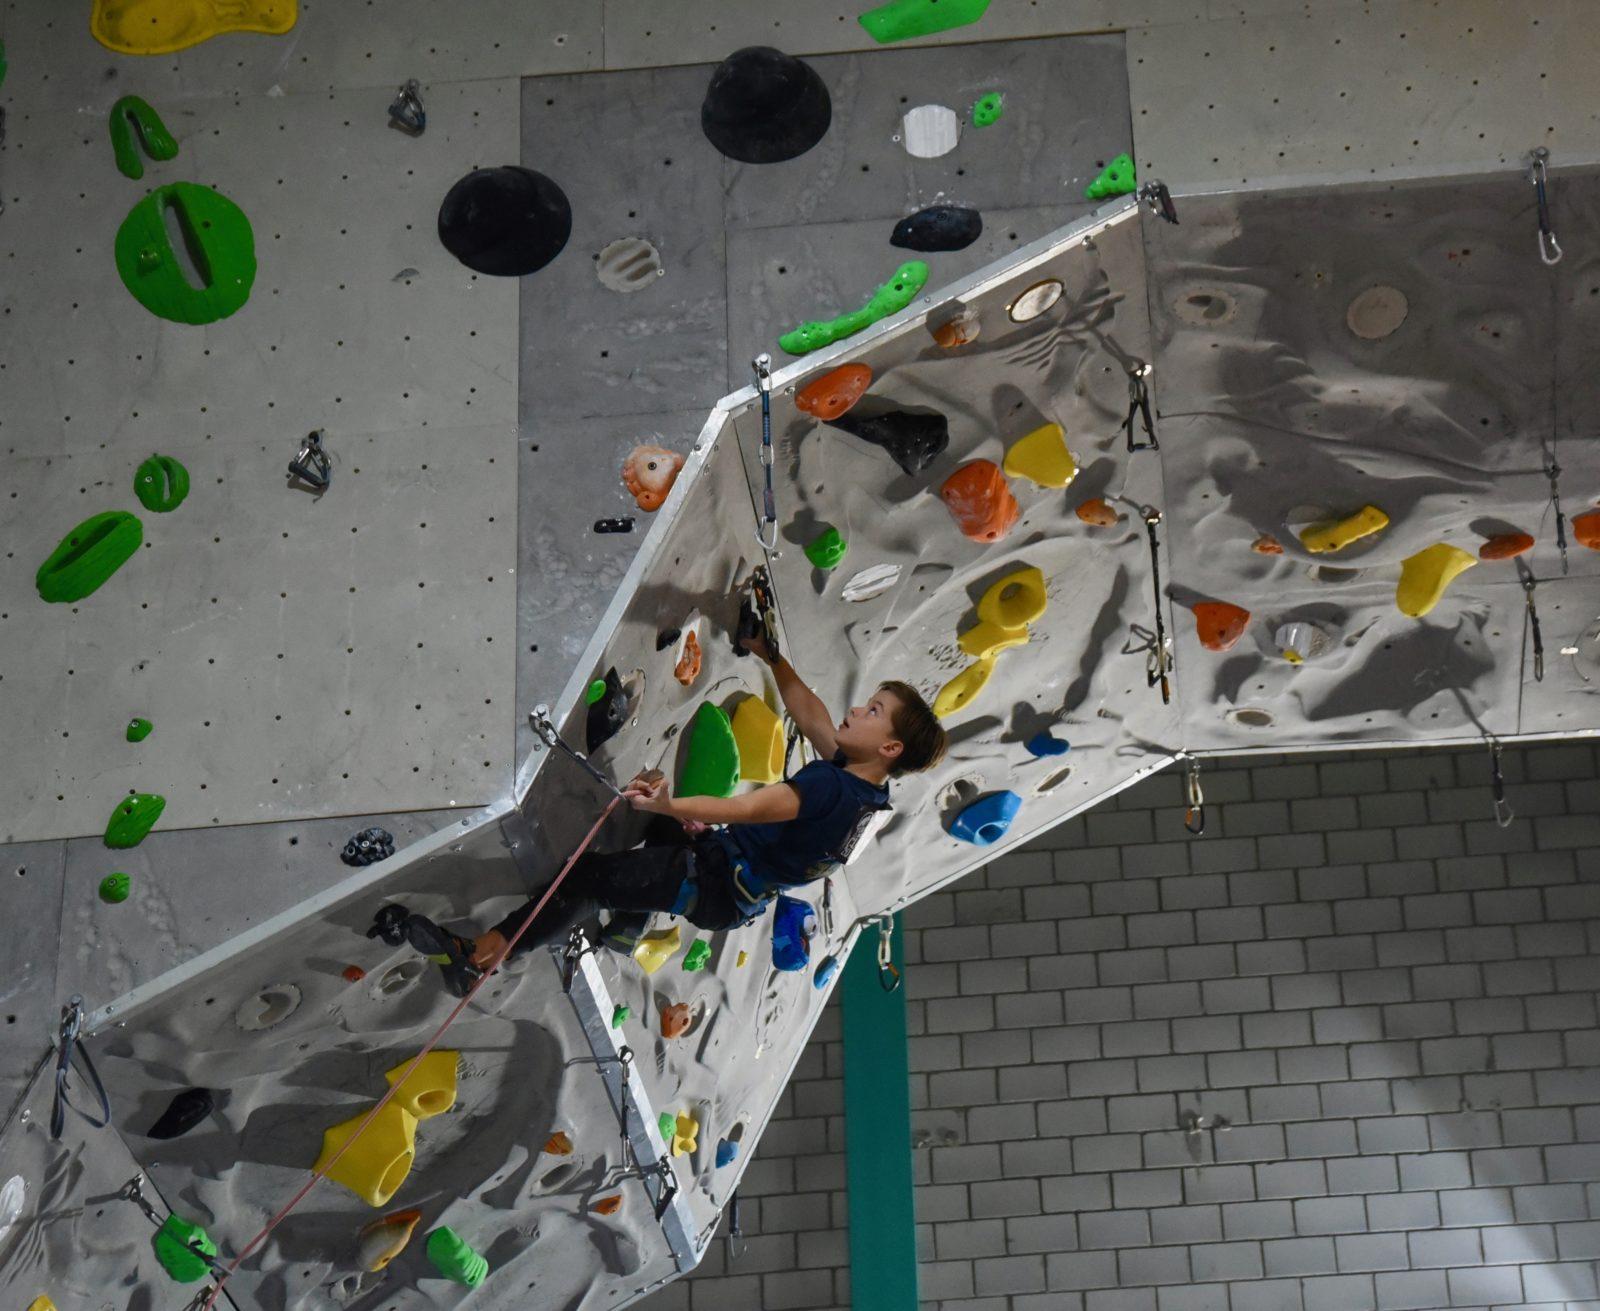 Regionalzentrum Sportklettern NWS